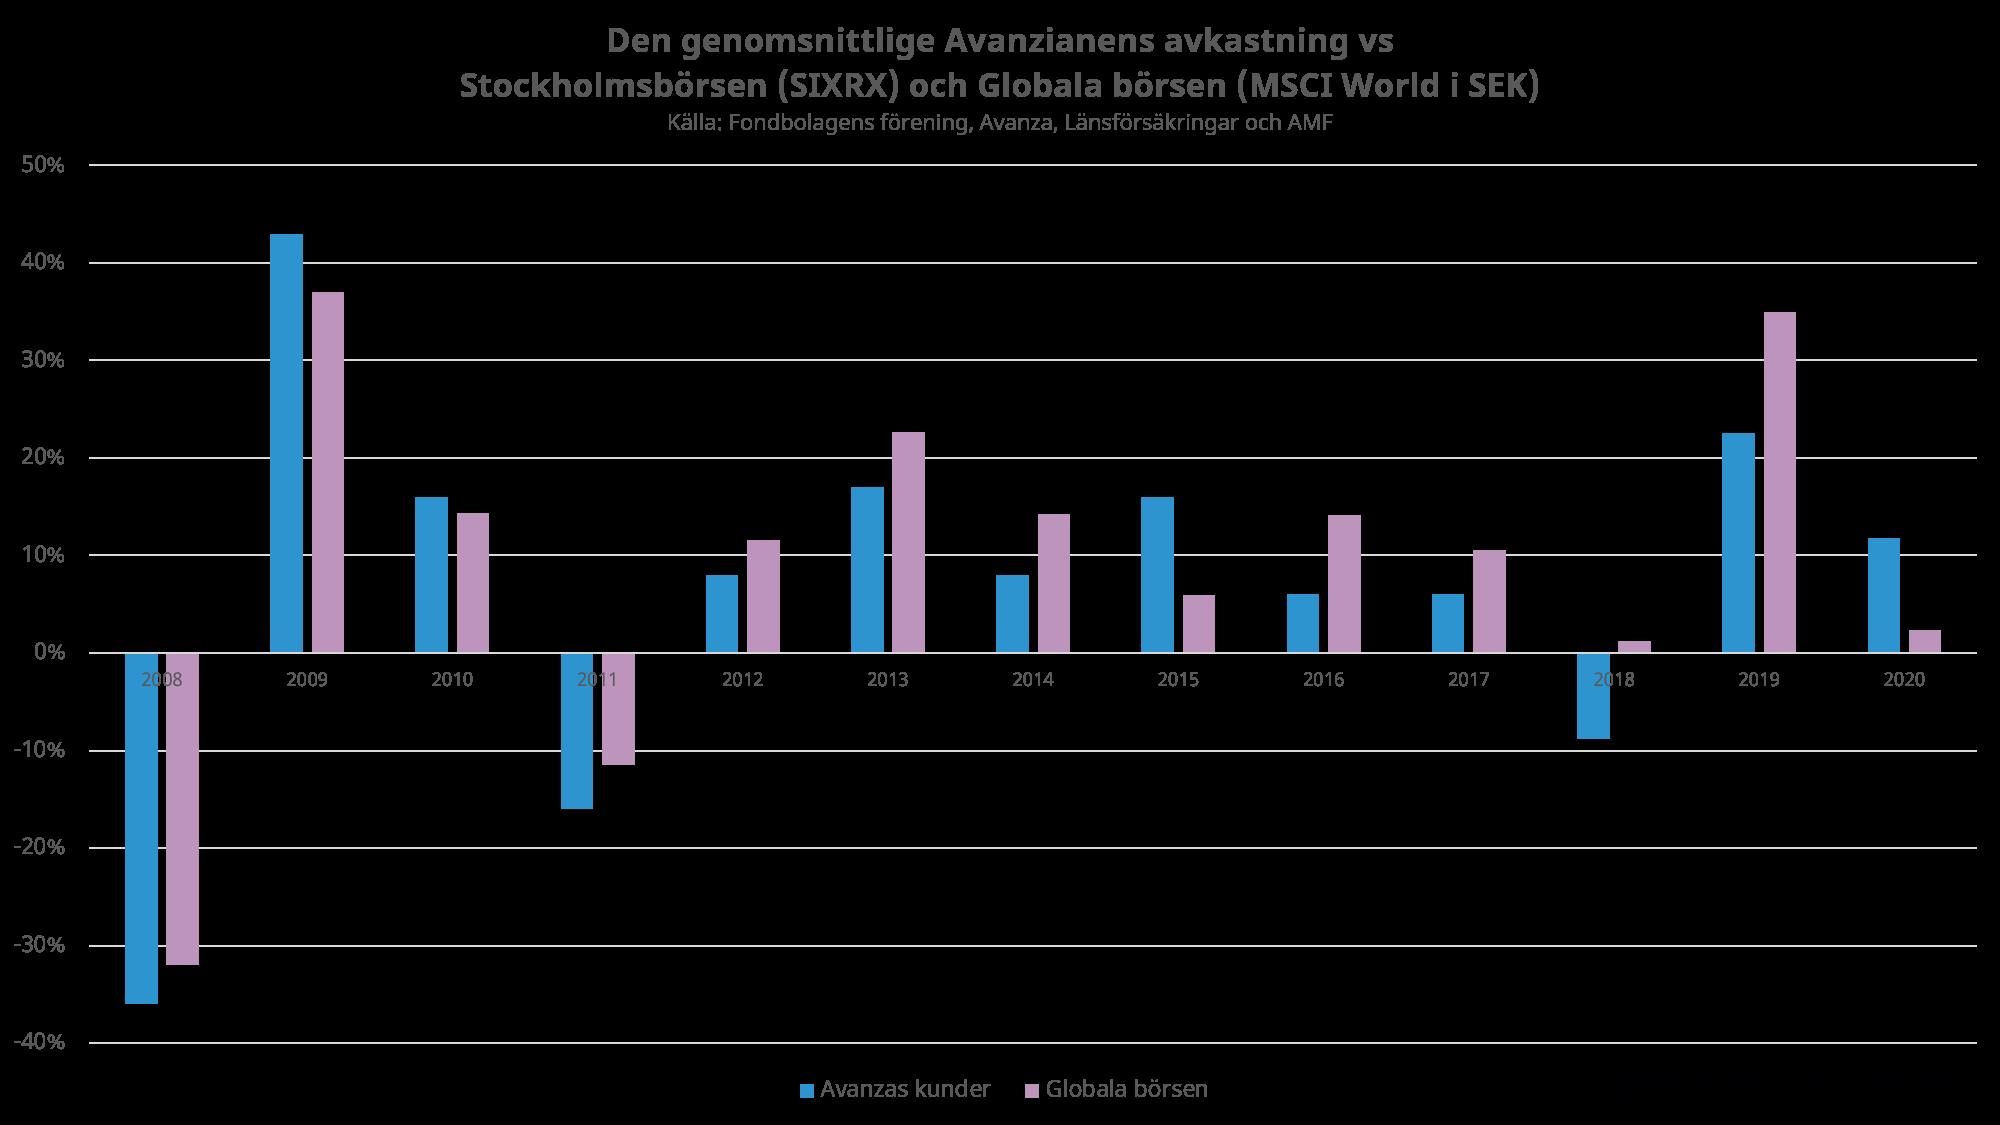 Genomsnittlige avanzianen vs Globala börsen (MSCI World i SEK)